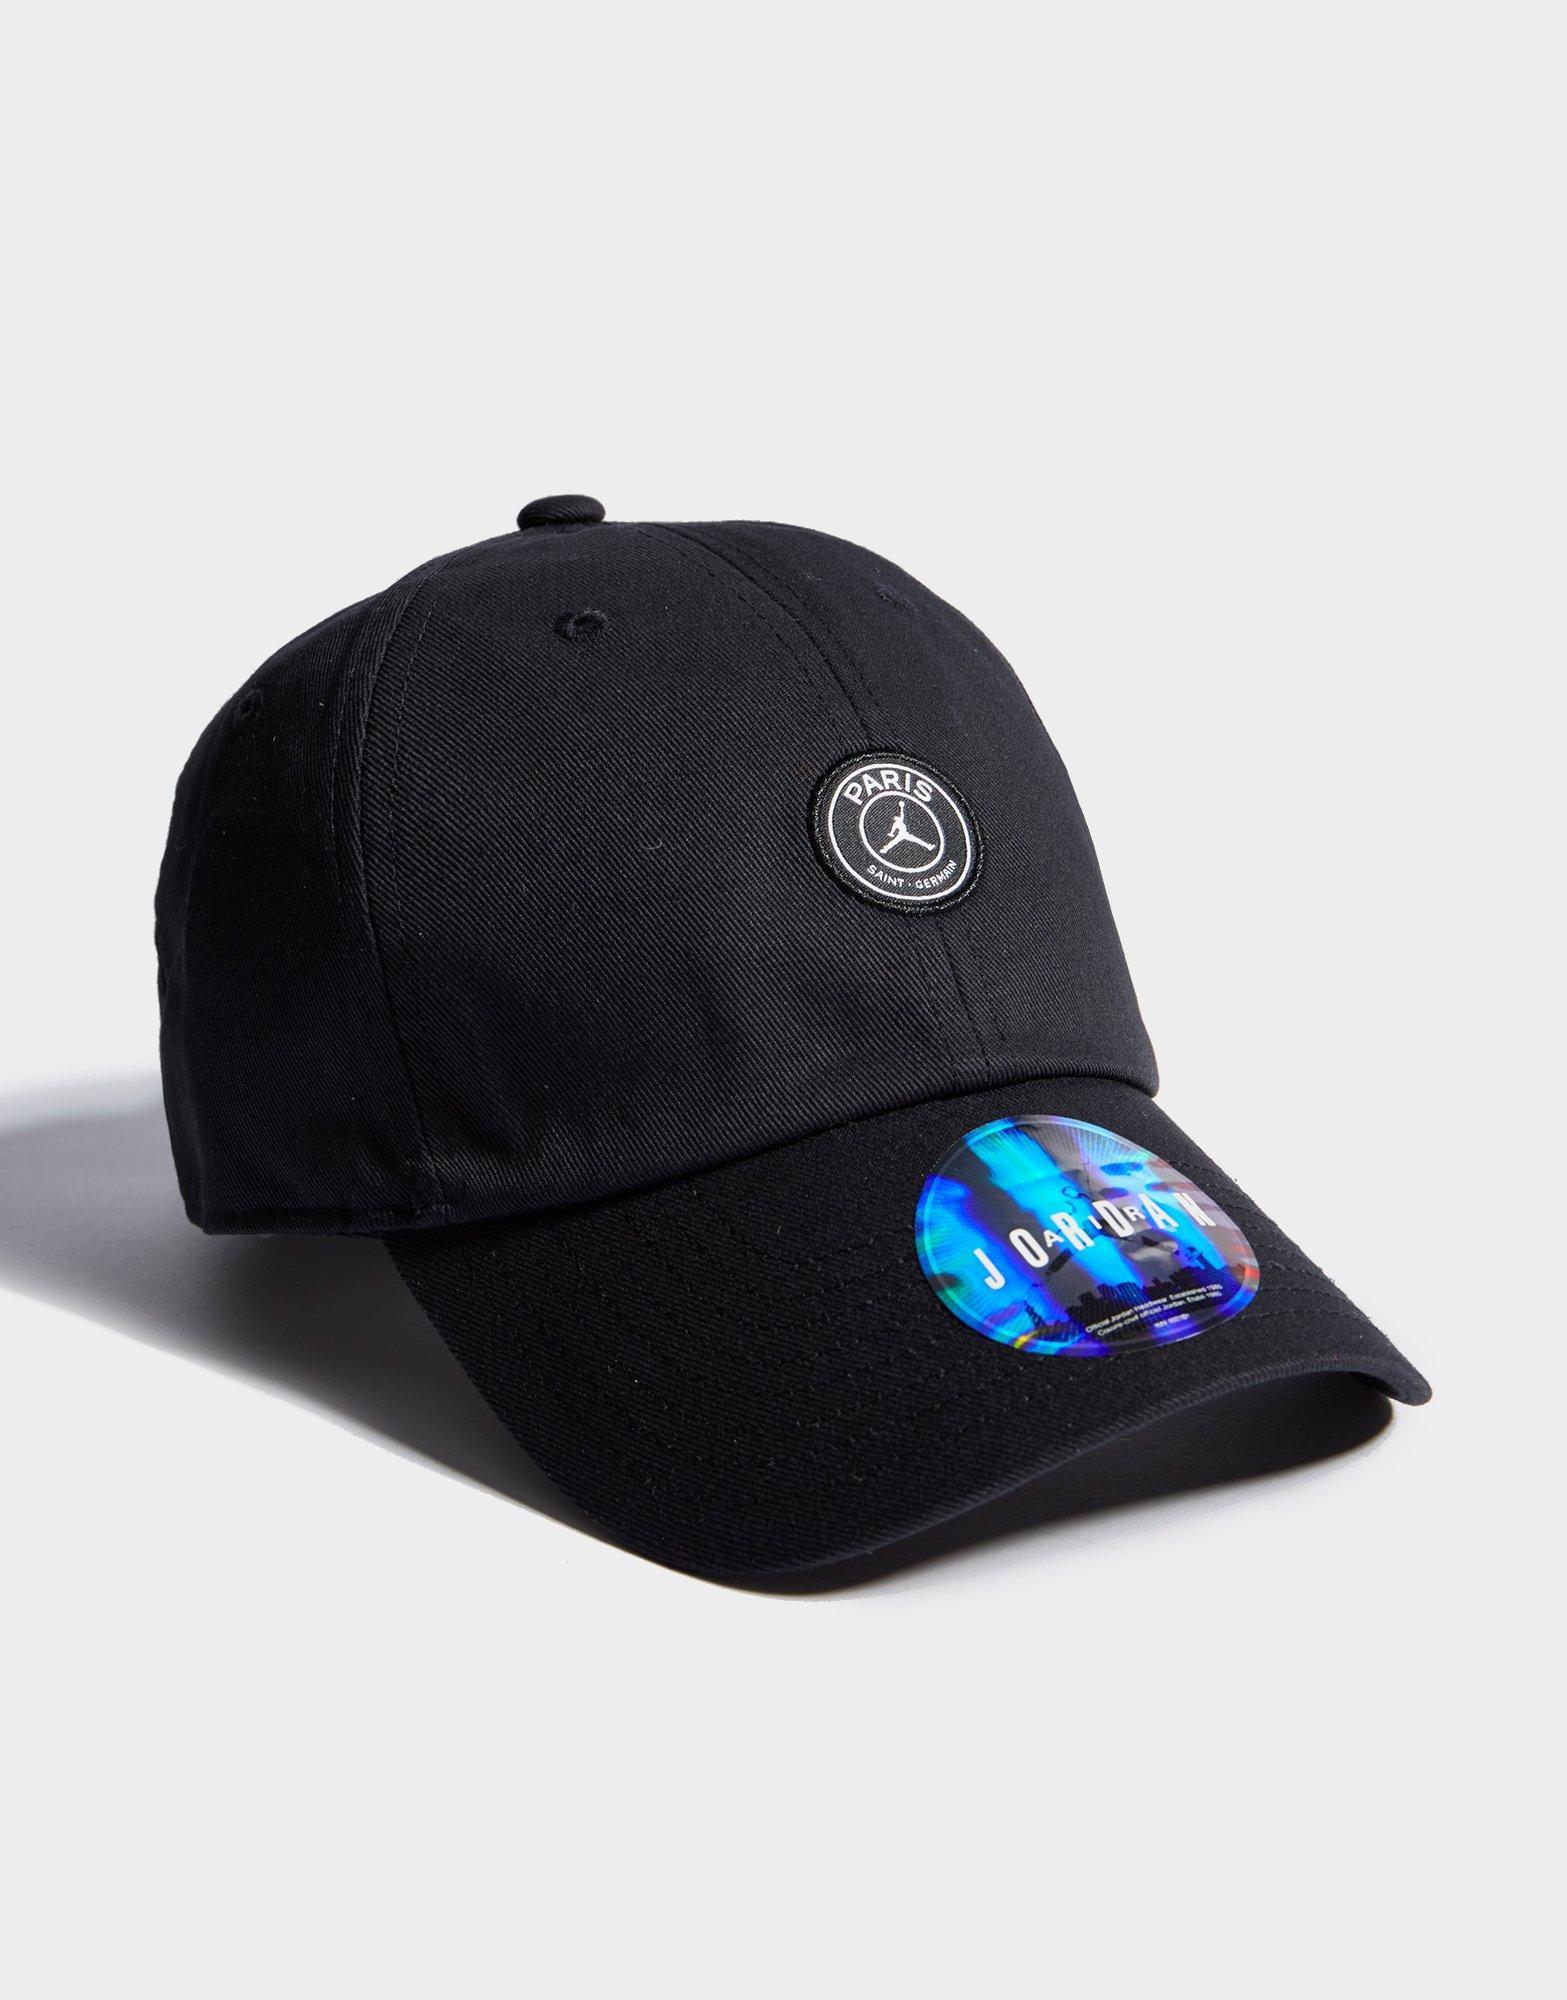 e64a1a86375 Lyst - Nike X Paris Saint Germain H86 Cap in Black for Men